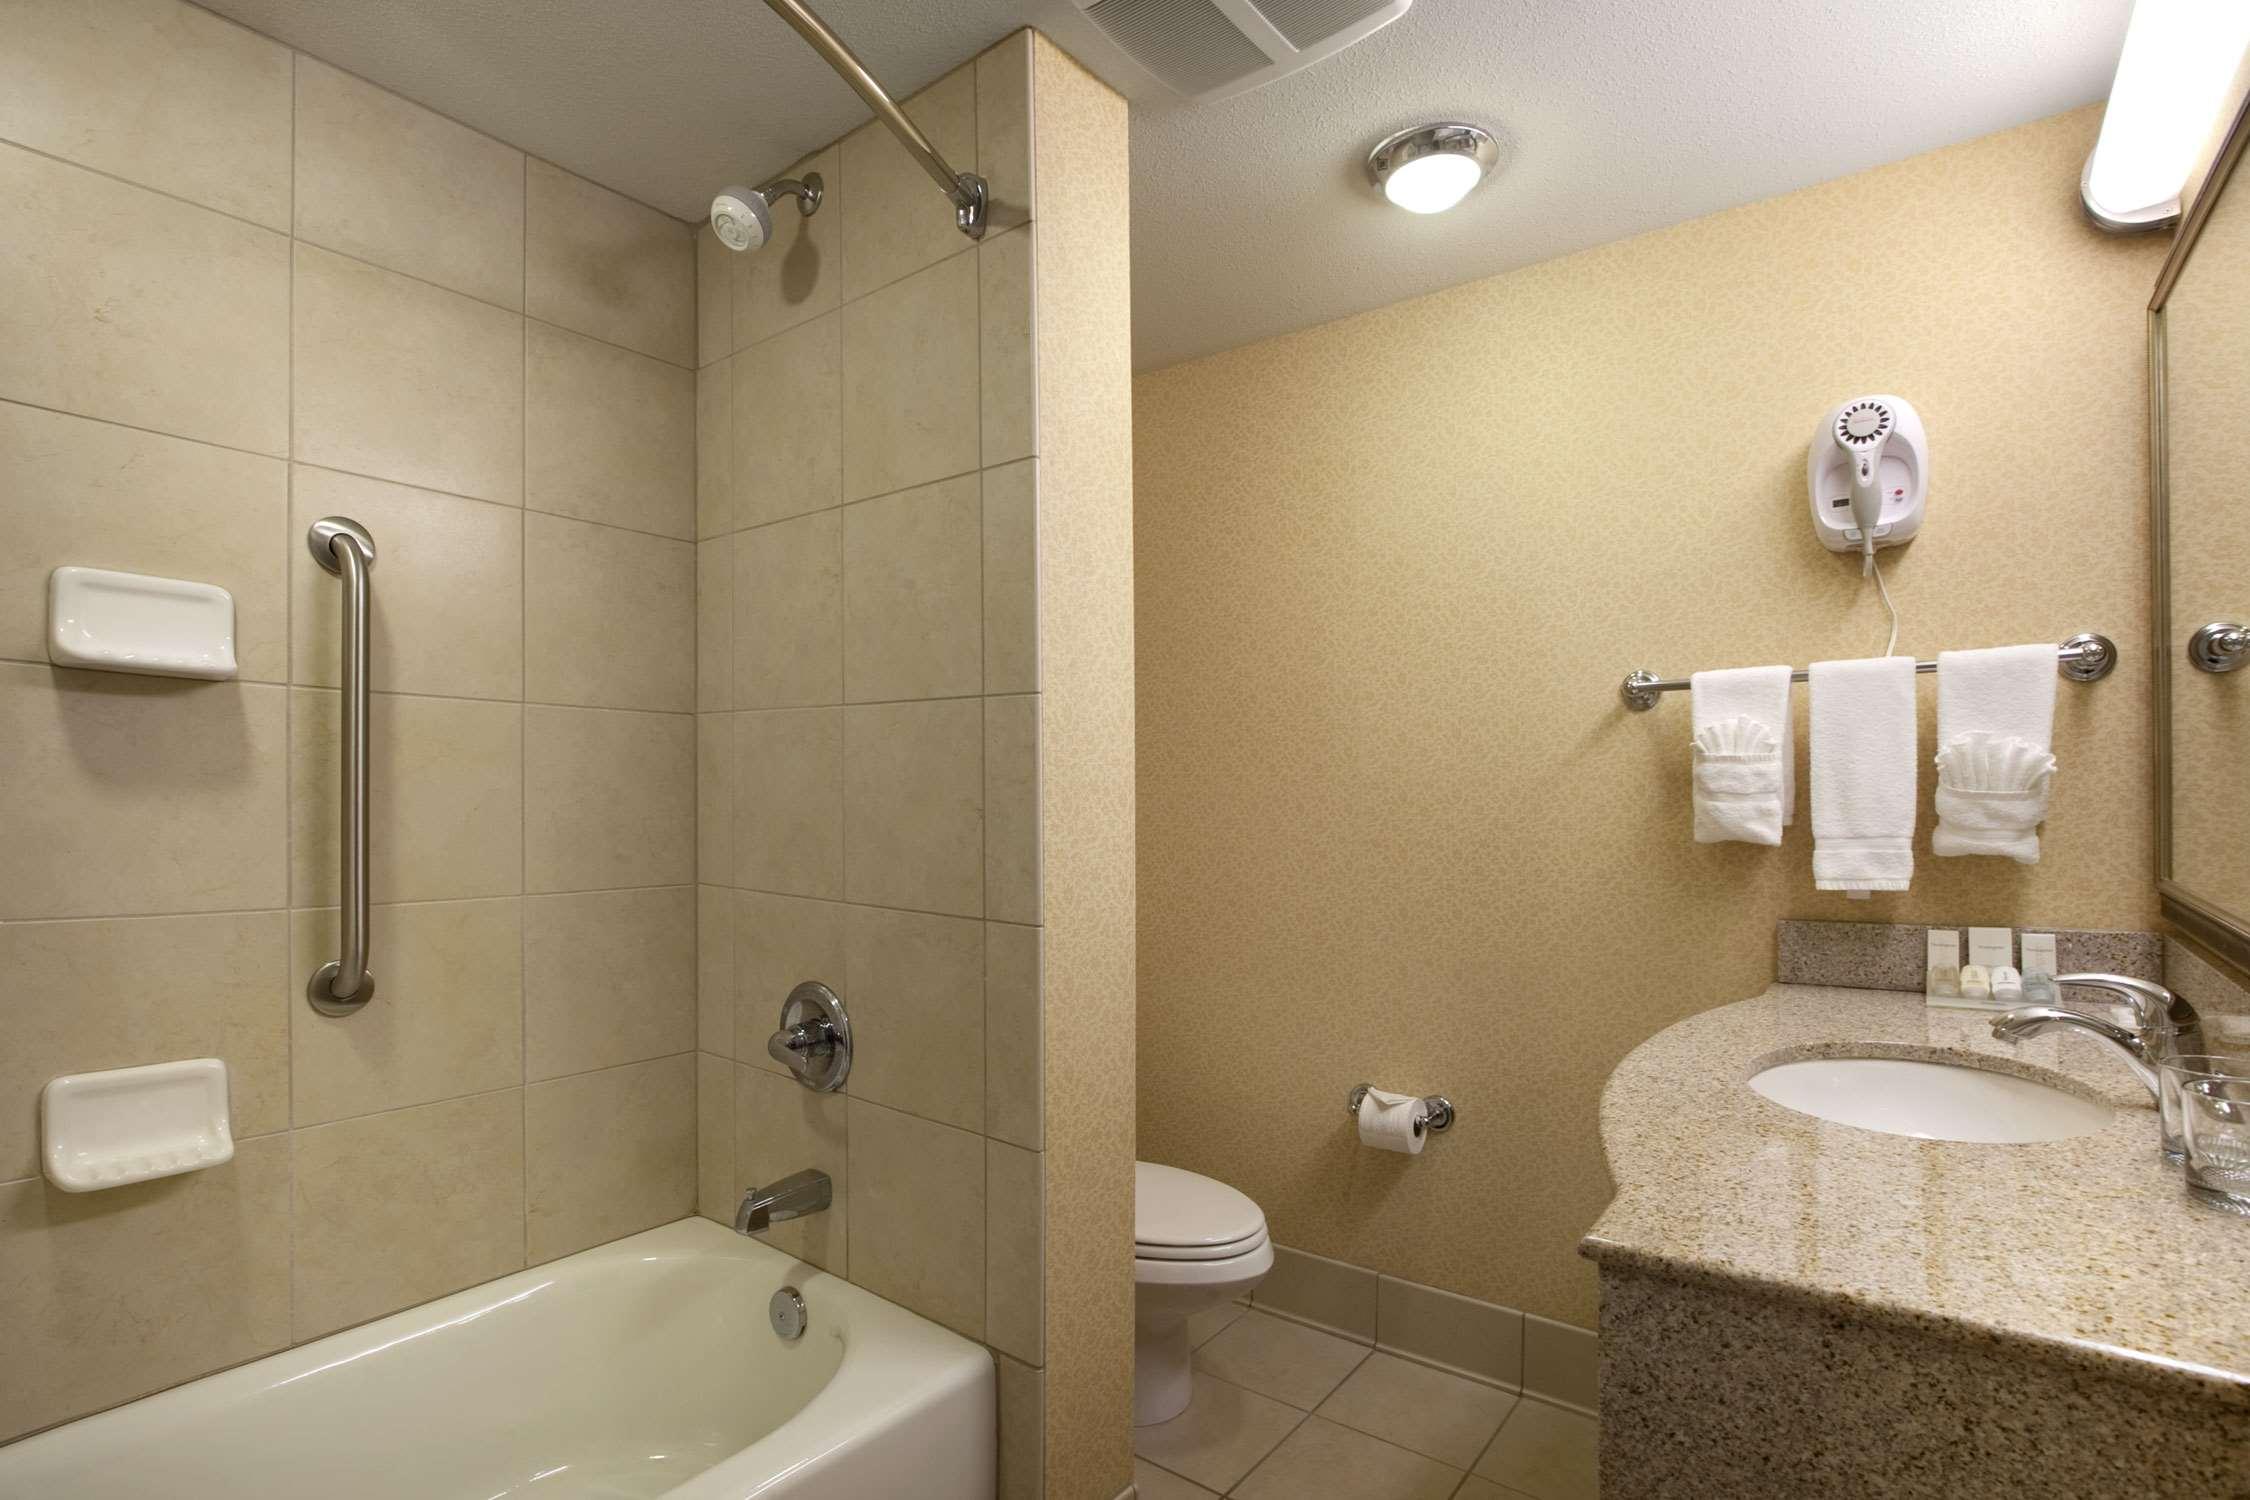 Hilton Garden Inn Champaign/ Urbana image 8